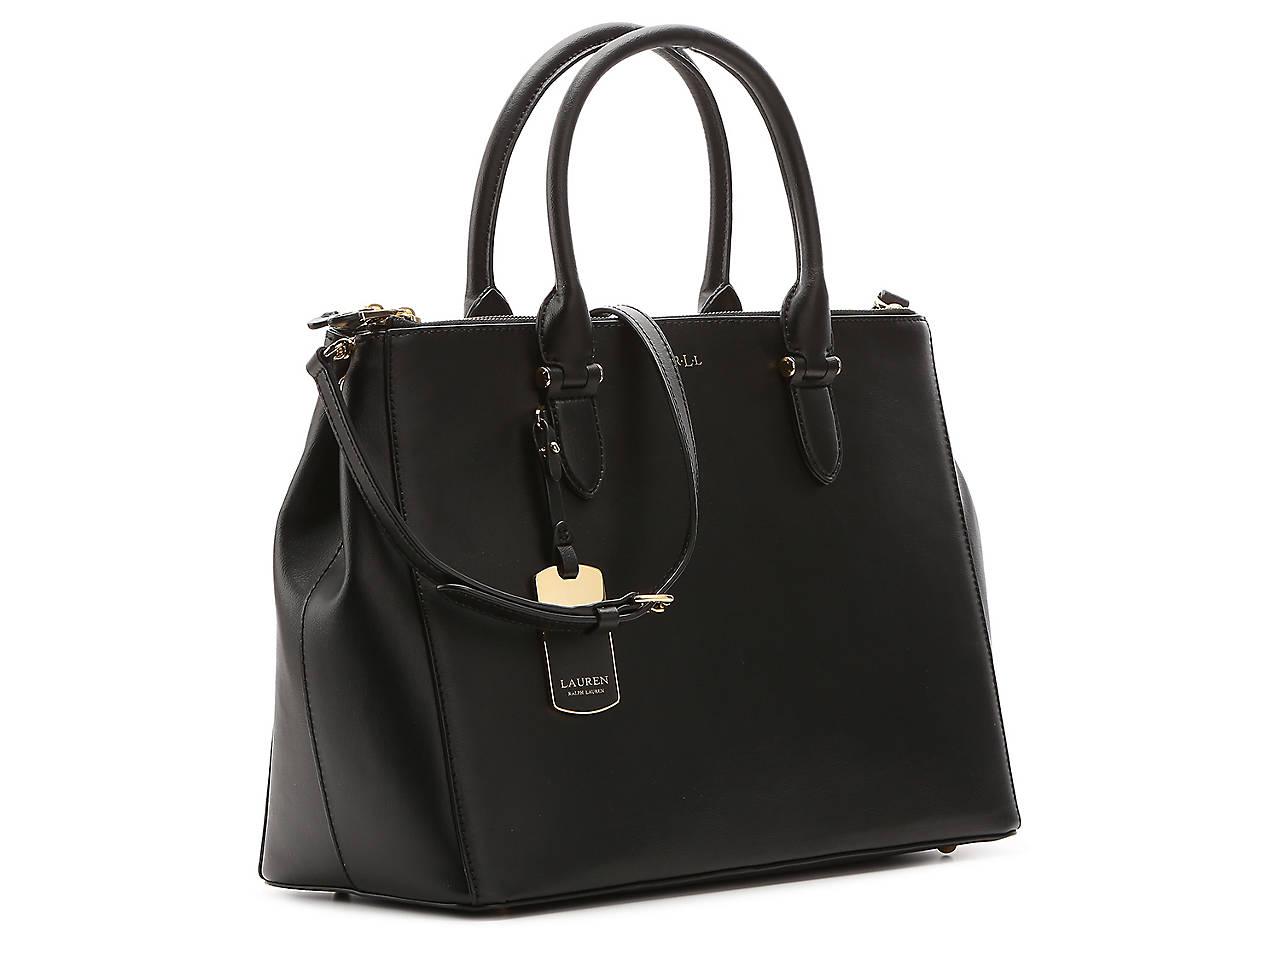 831da61b55cb Lauren Ralph Lauren Winford Leather Satchel Women s Handbags ...